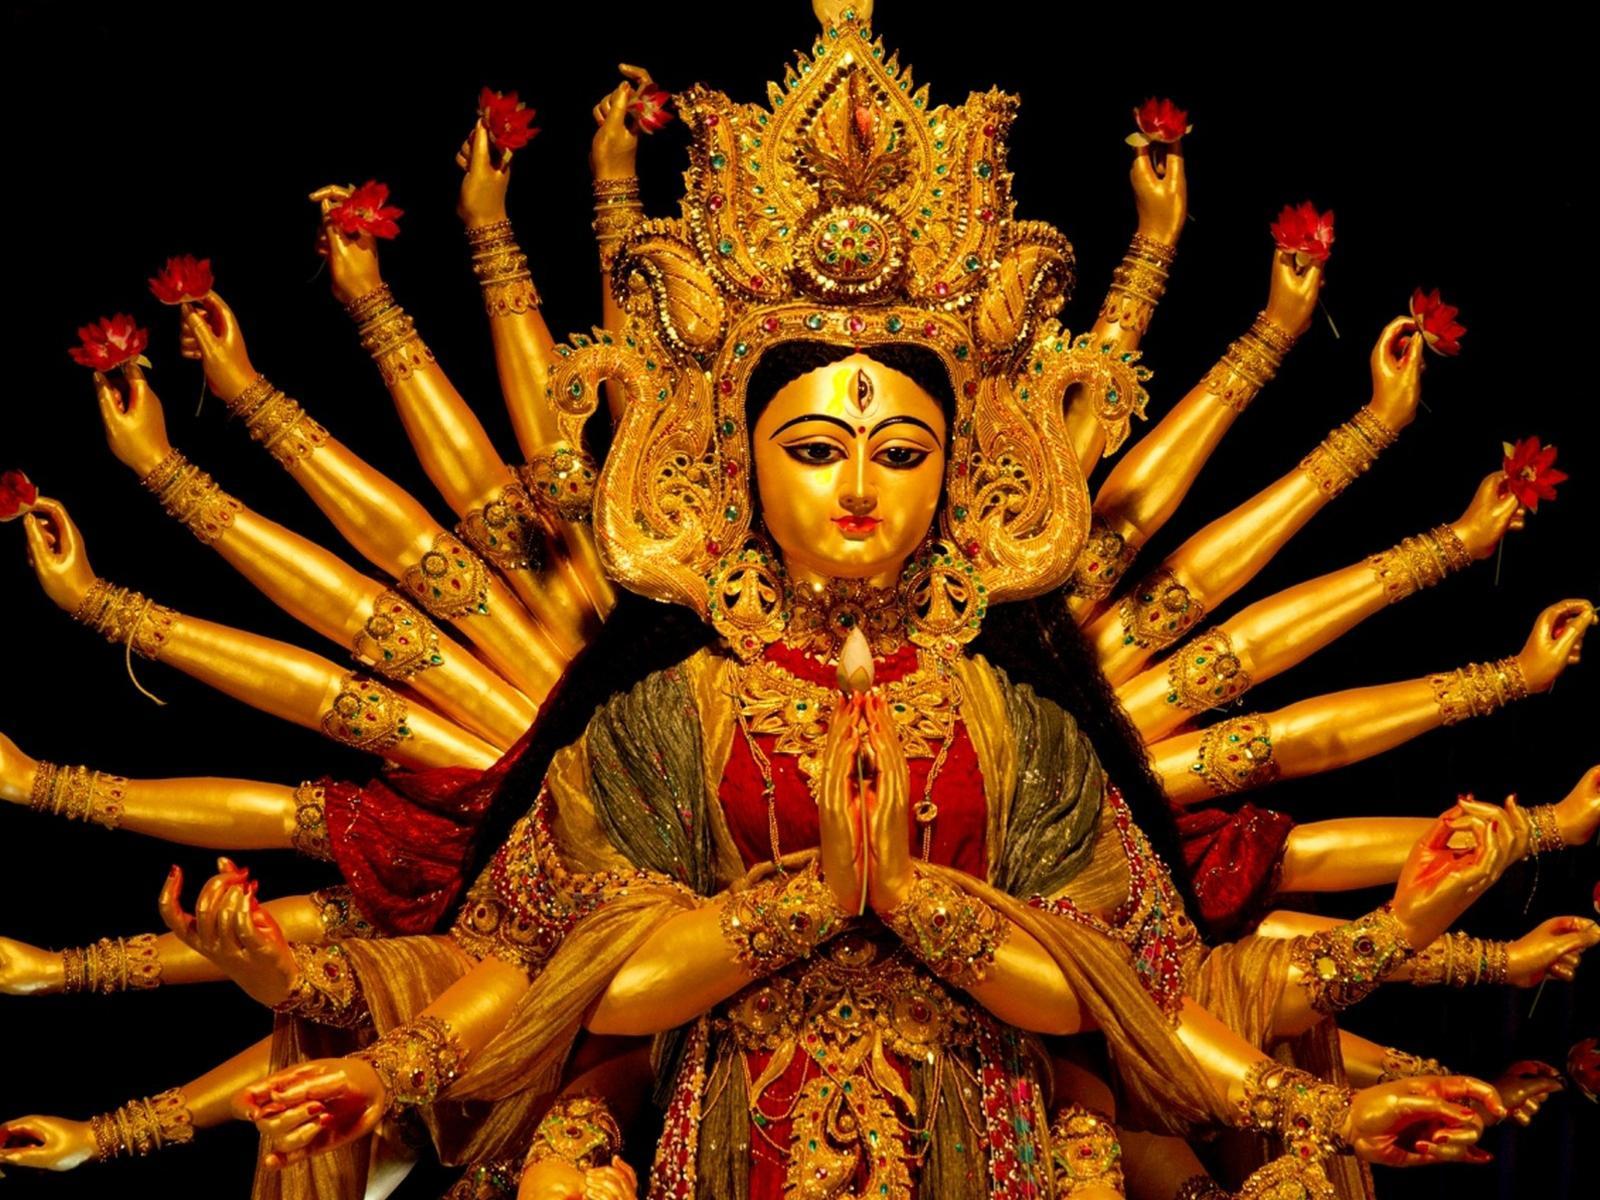 Happy Durga Puja 2018